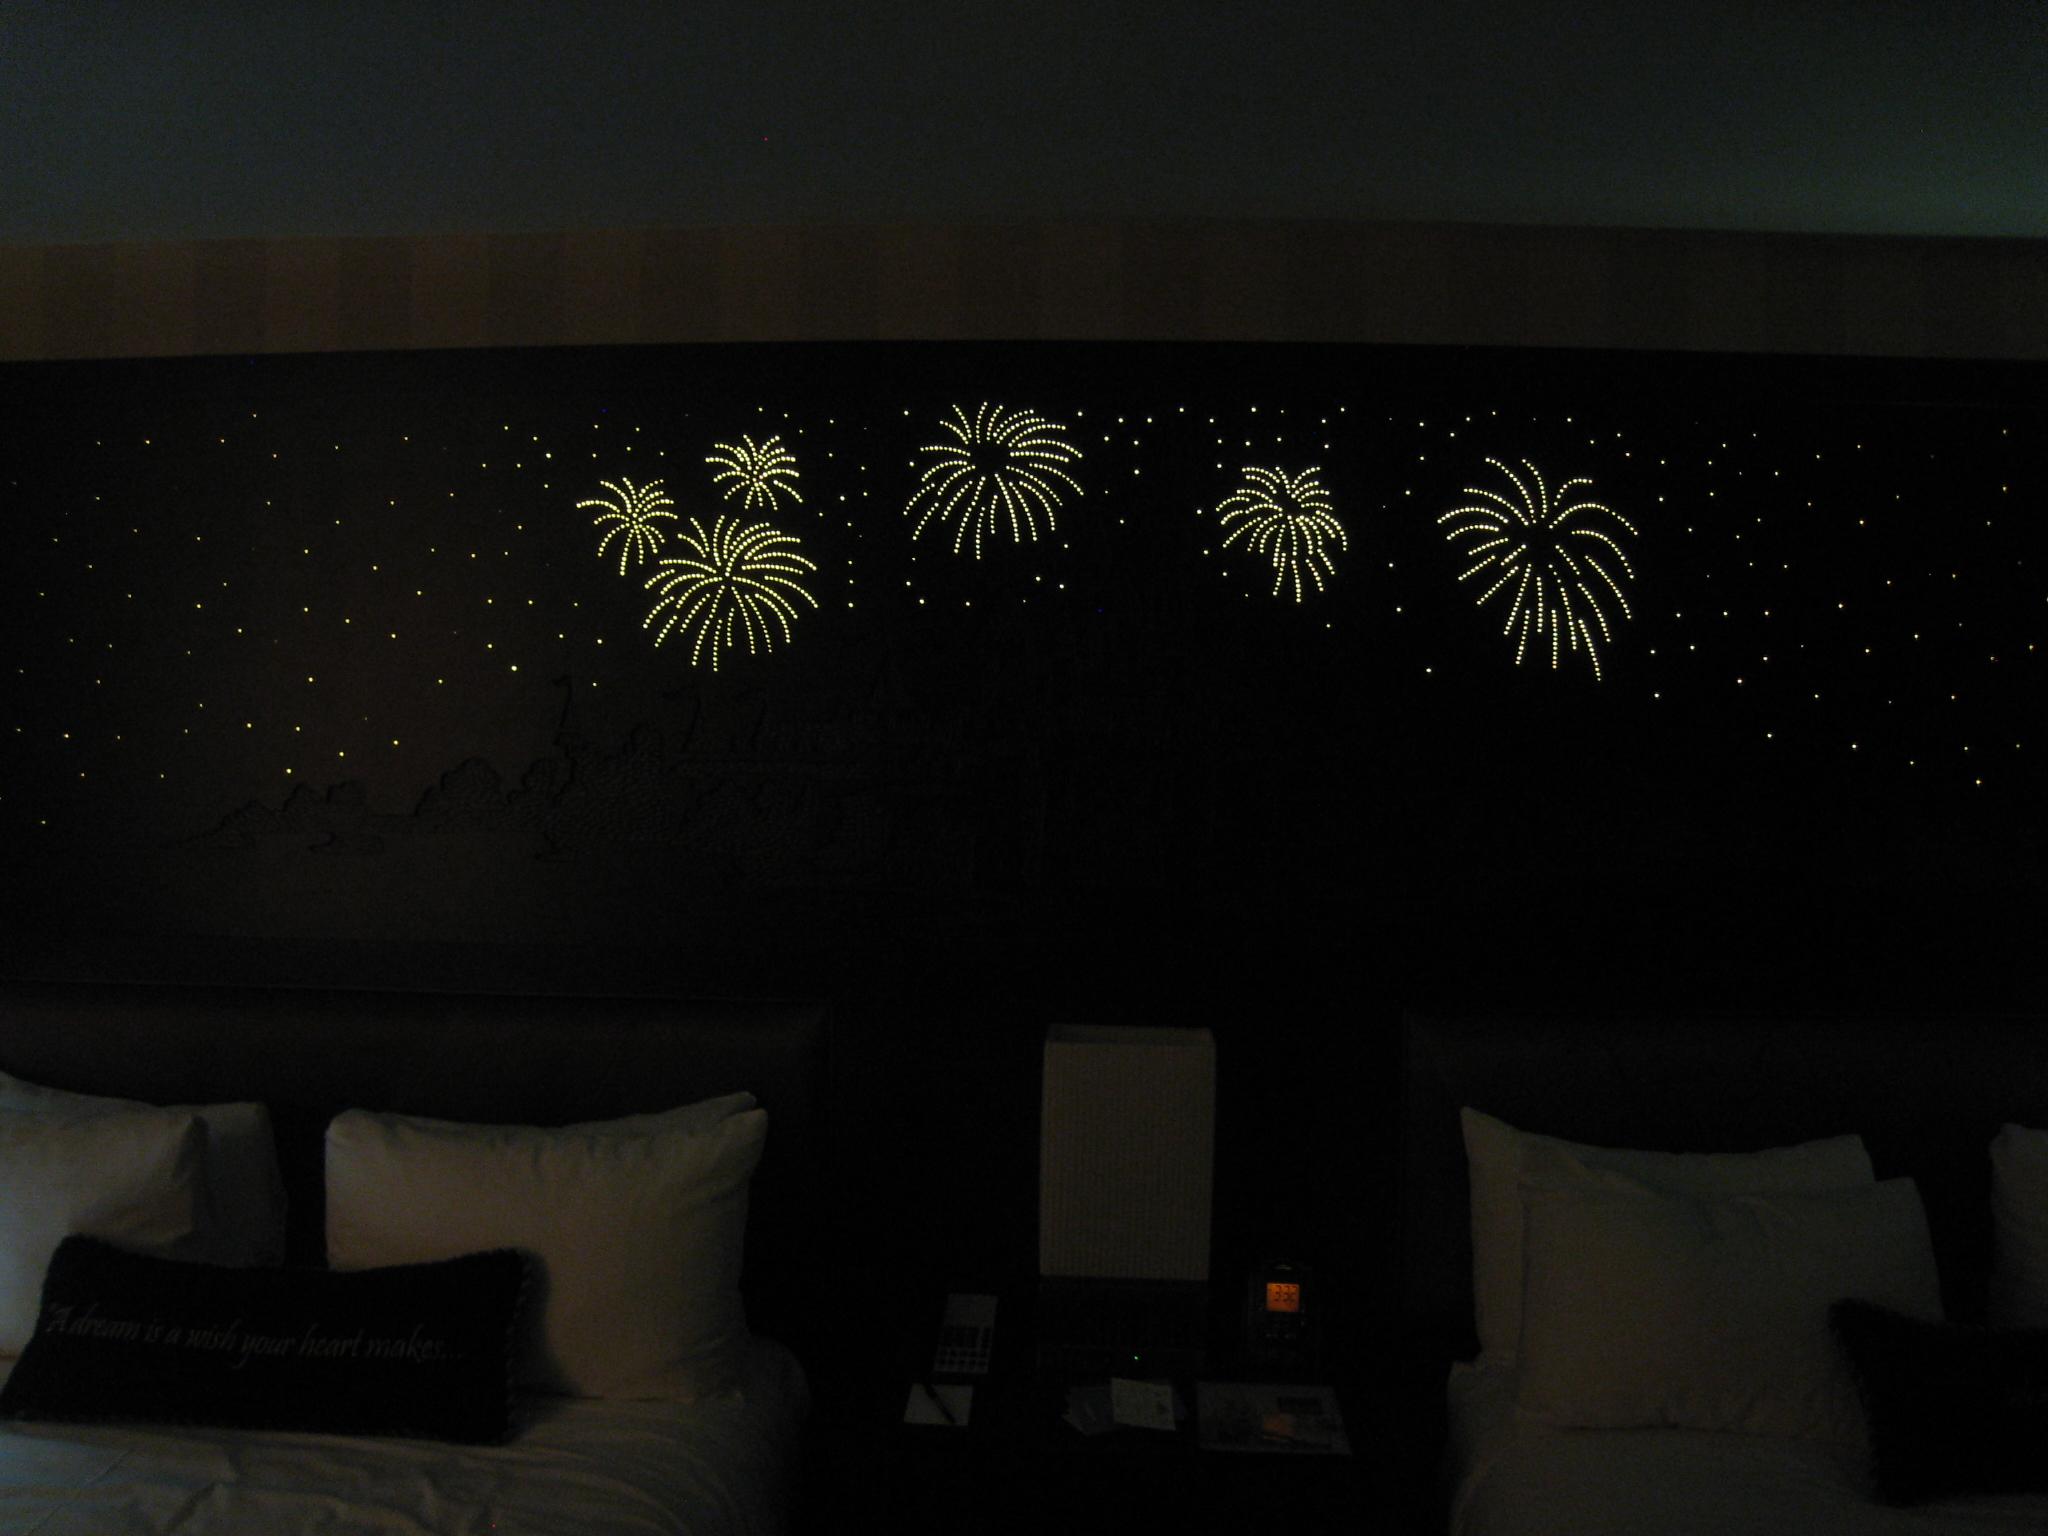 Headboard Fireworks